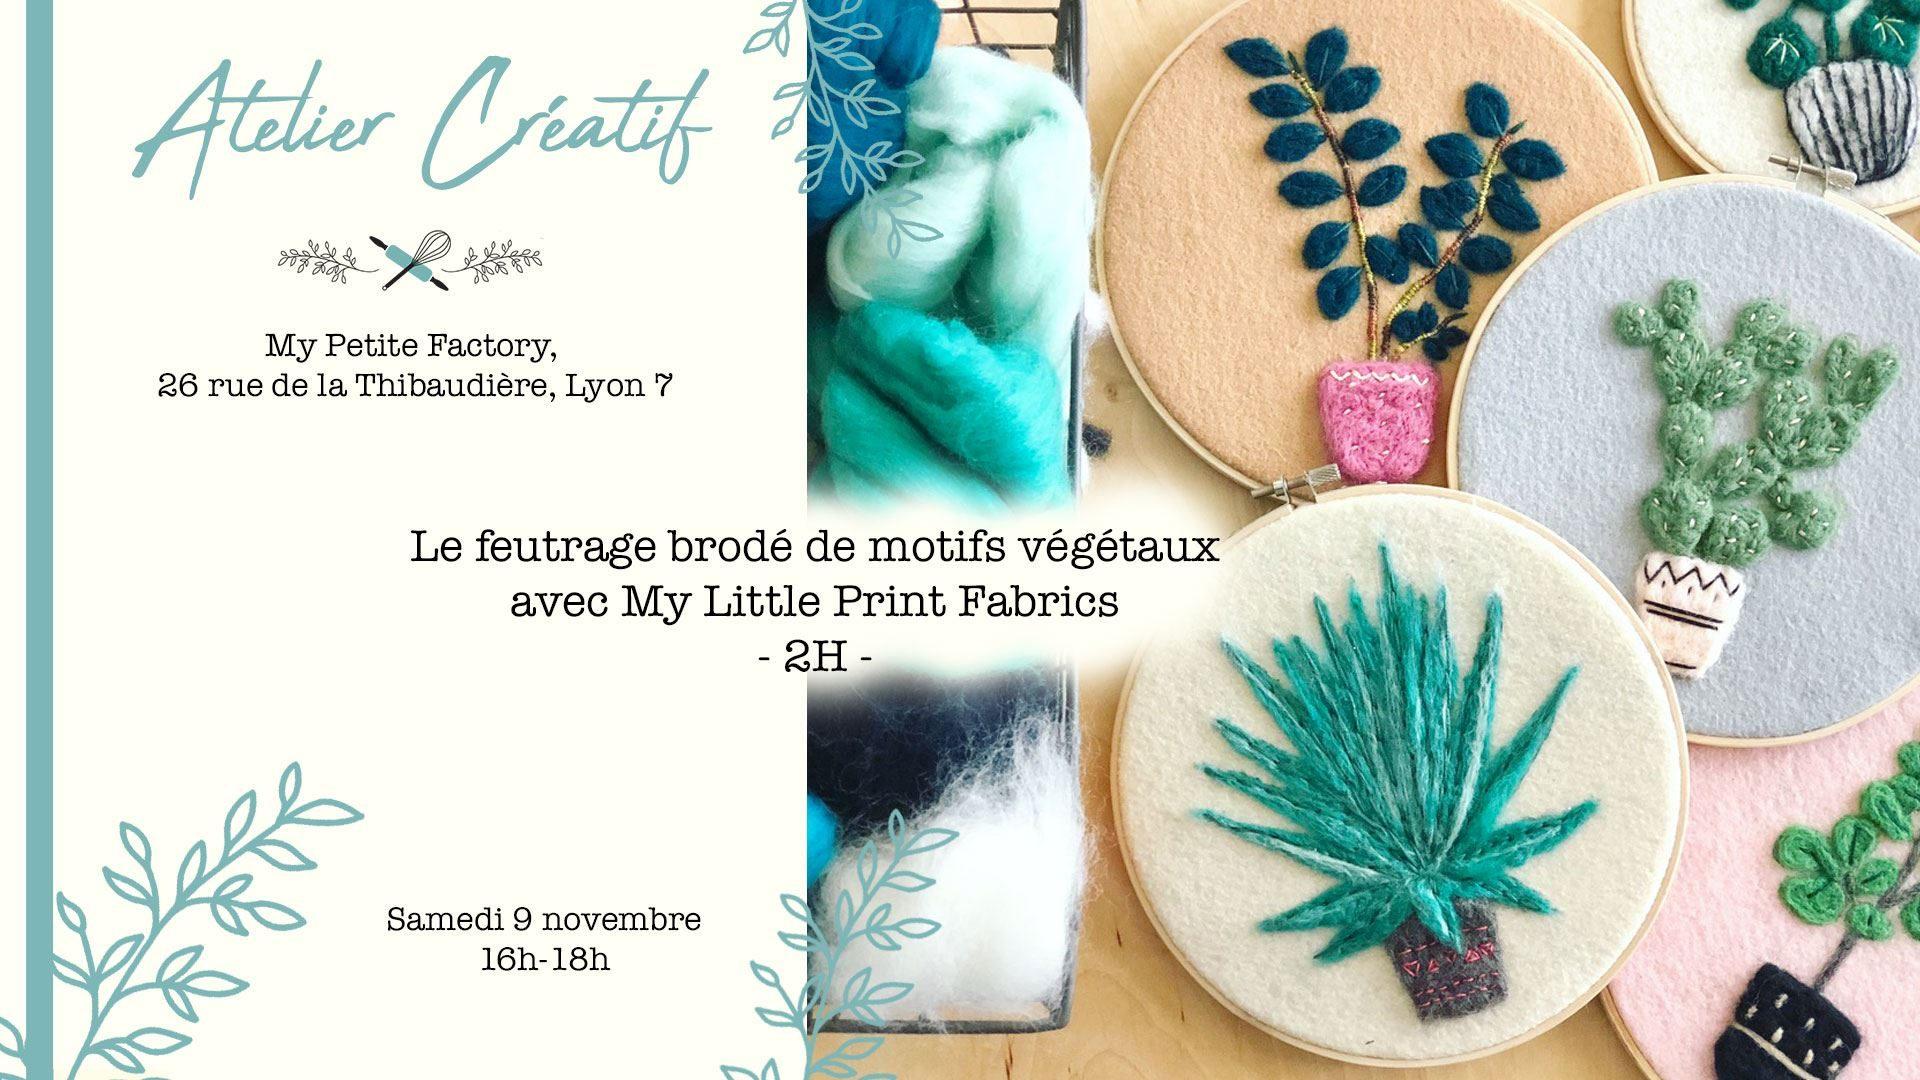 Atelier-feutrage-broderie-9nov2019